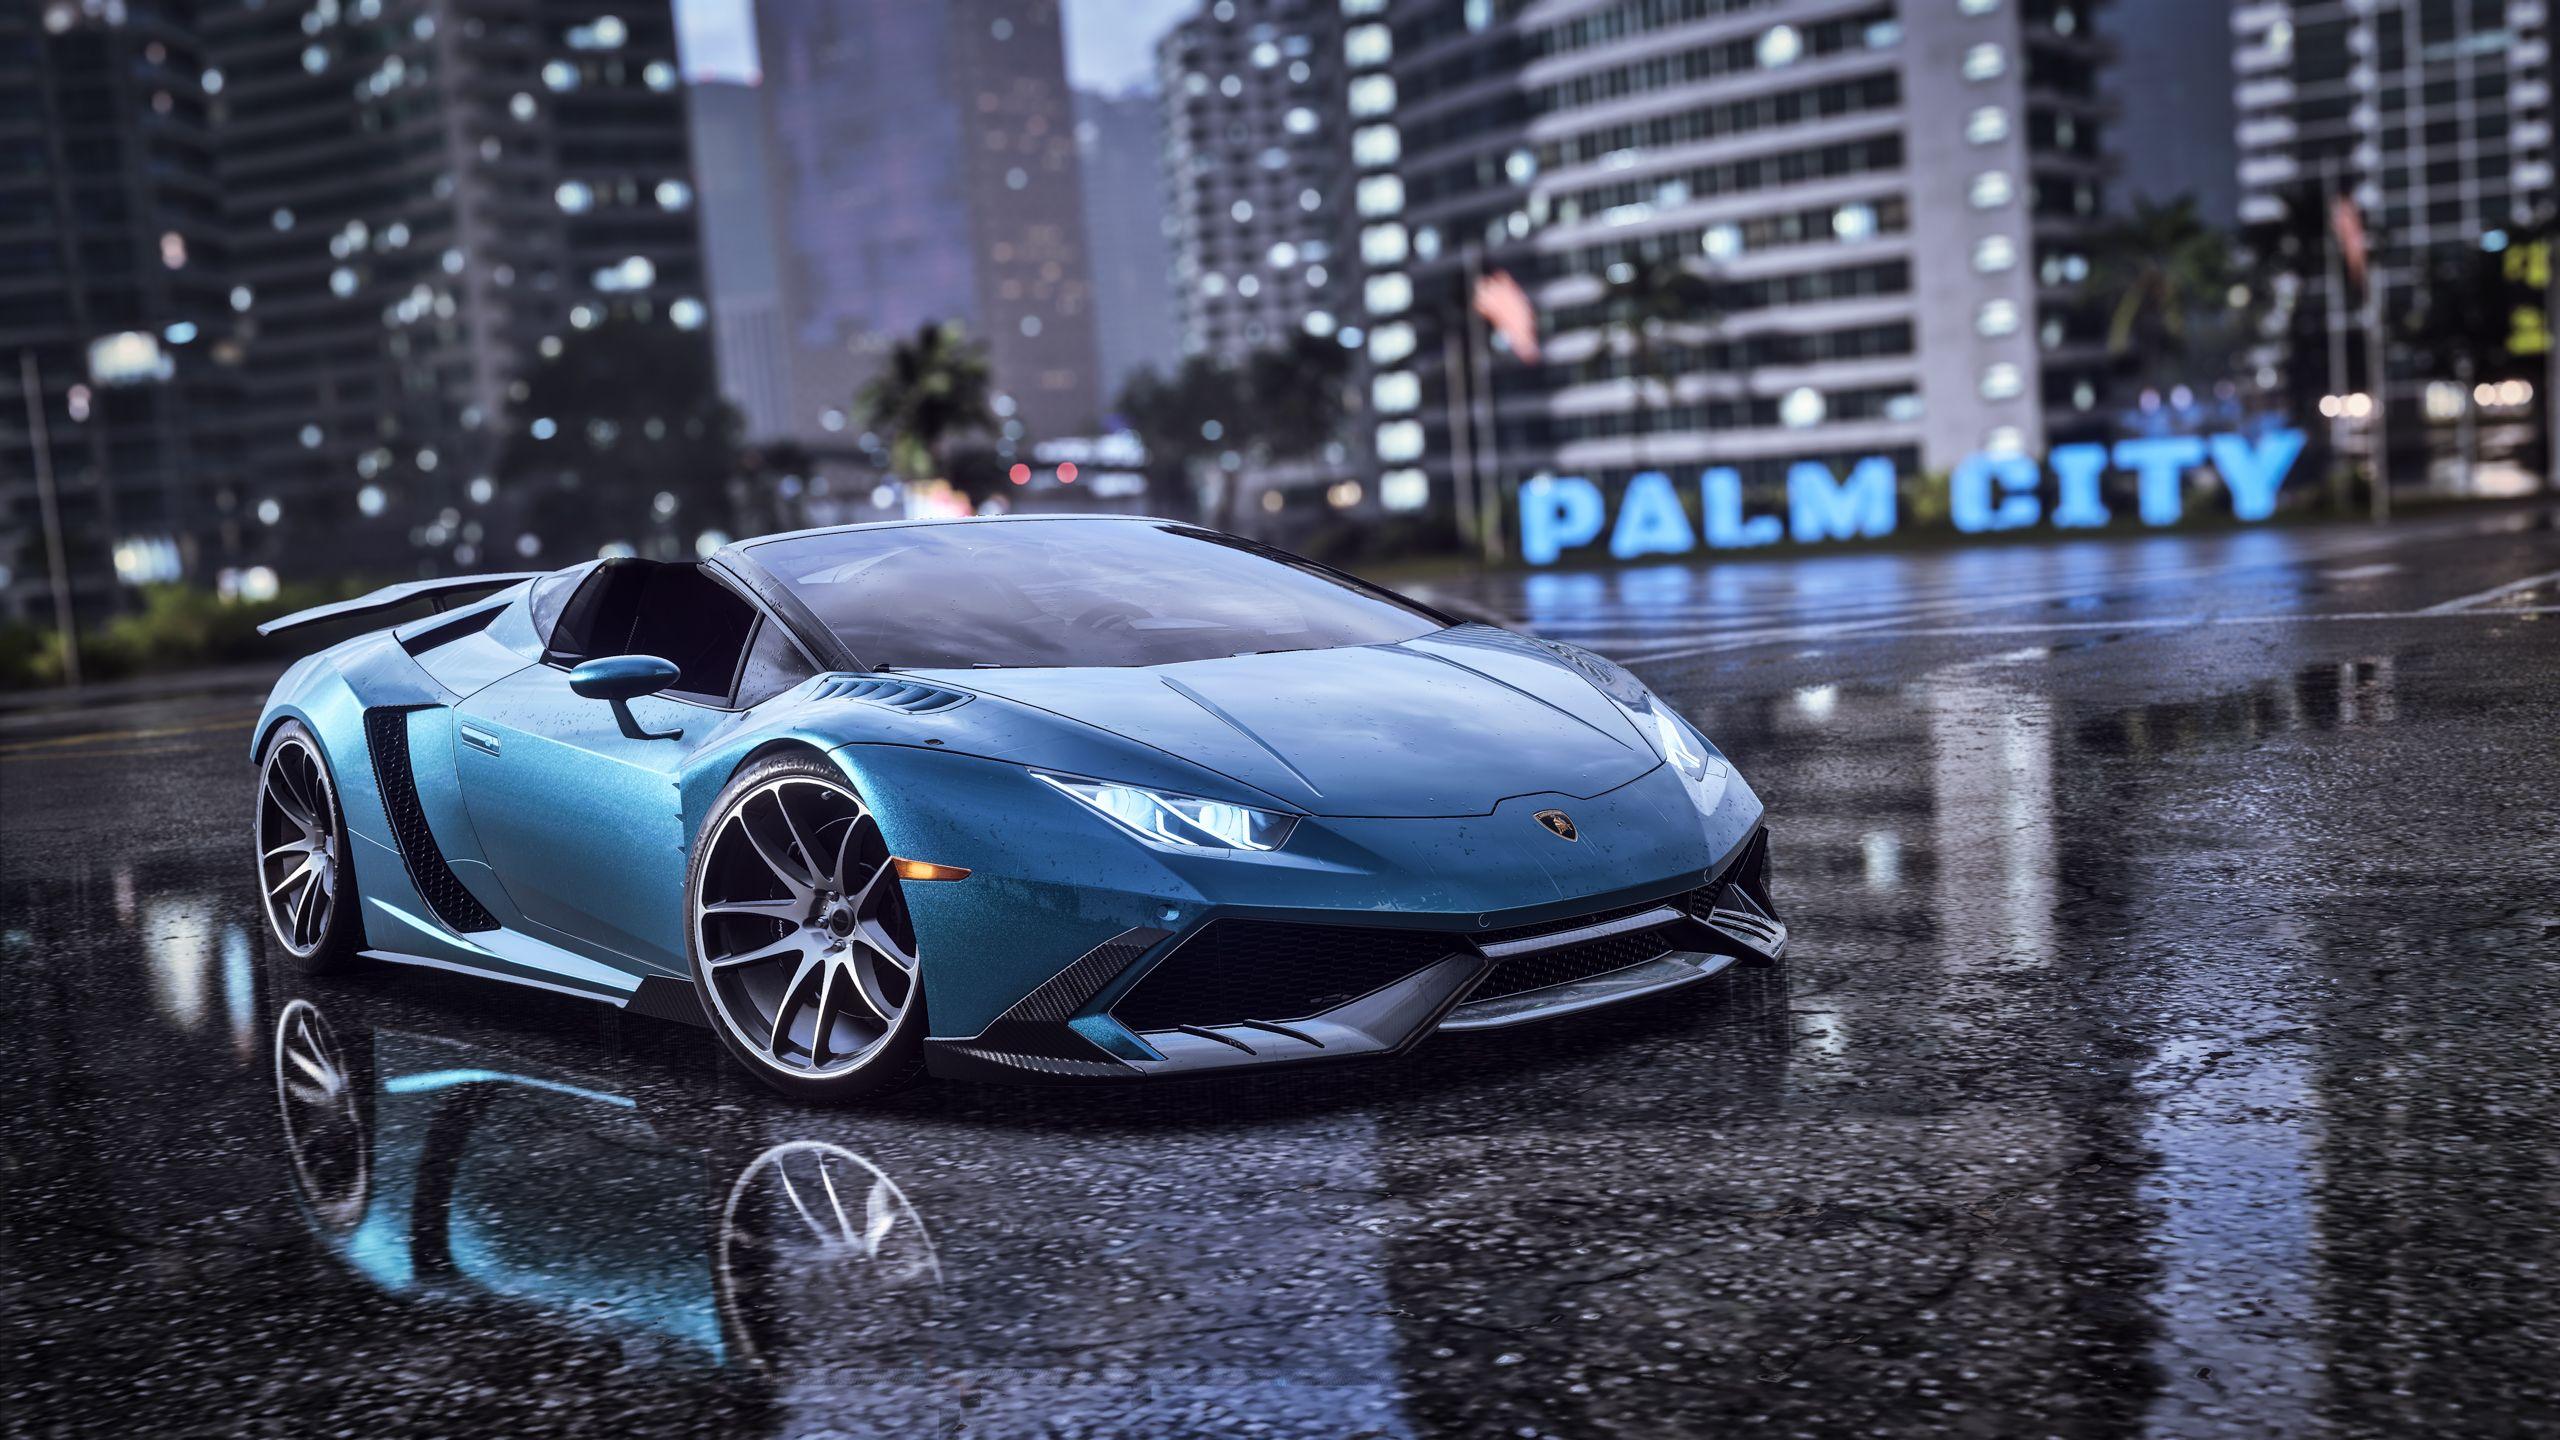 2560x1440 Lamborghini Car Need For Speed Heat 2019 Wallpaper Need For Speed Heat Need For Speed Need For Speed Heat Wallpaper